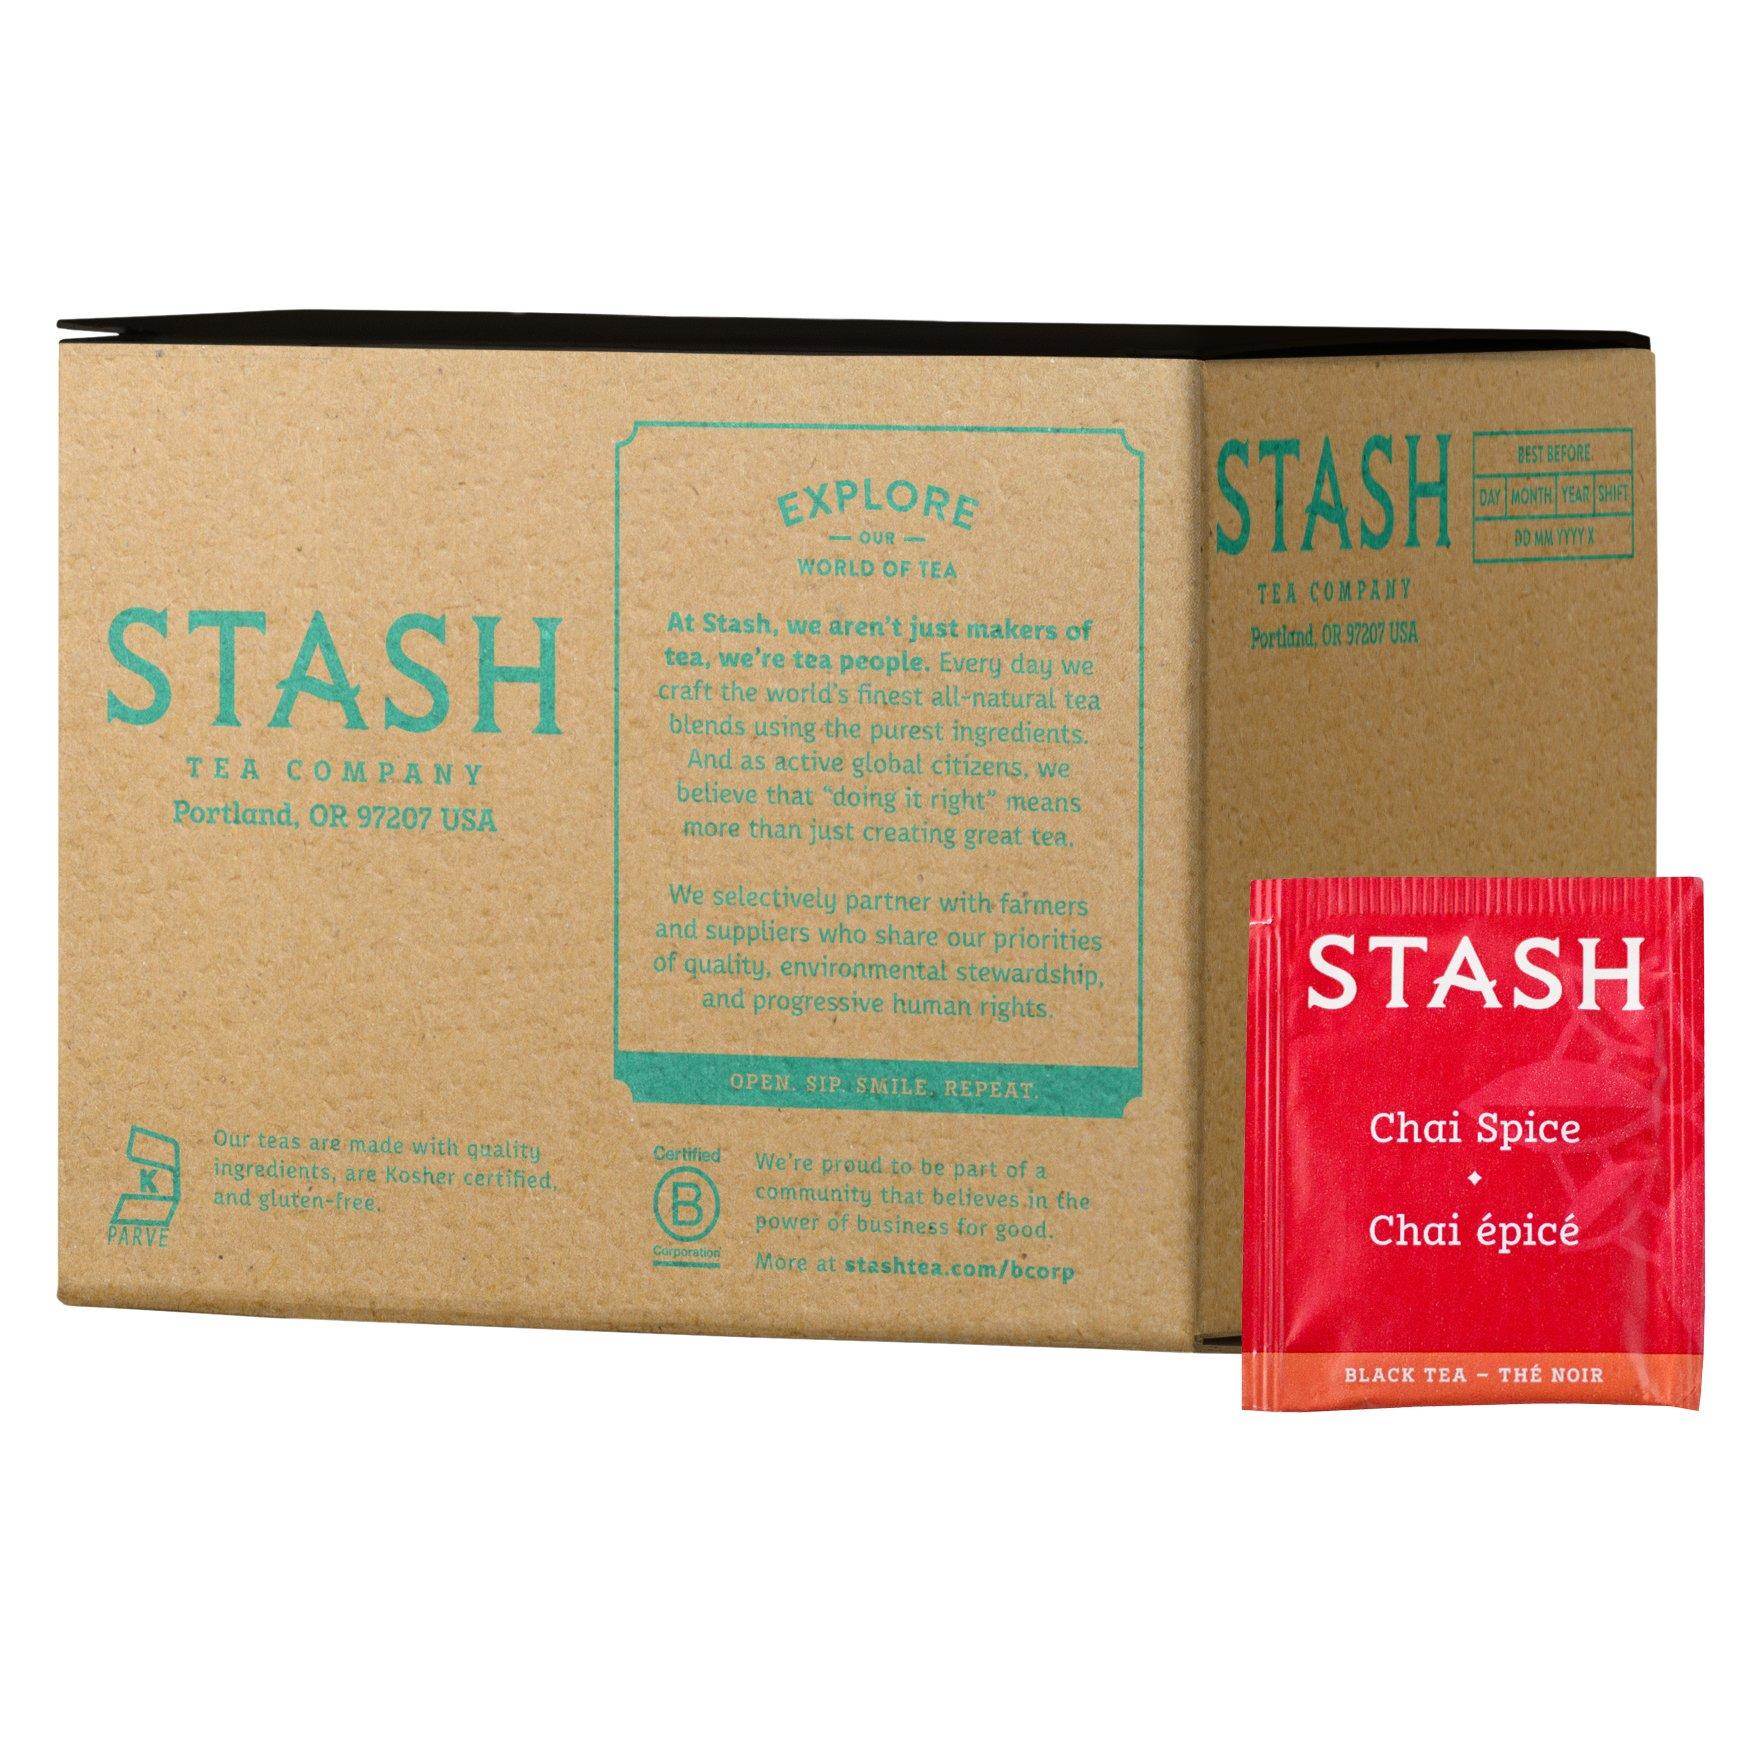 Stash Tea Chai Spice Black Tea, 100 Count Box of Tea Bags in Foil